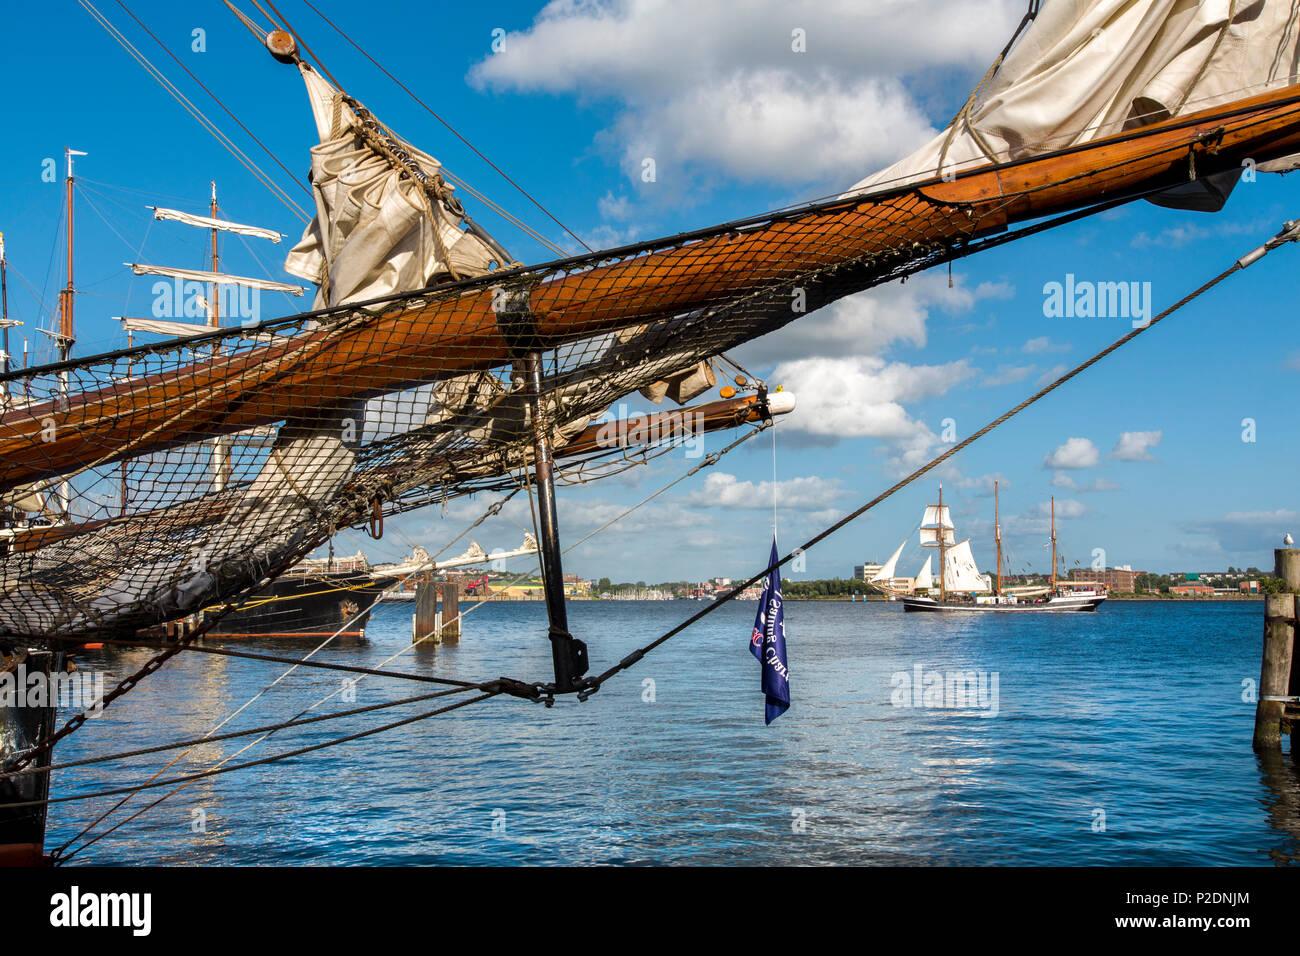 Sailing ship, Kieler Woche, Kiel, Baltic Coast, Schleswig-Holstein, Germany - Stock Image